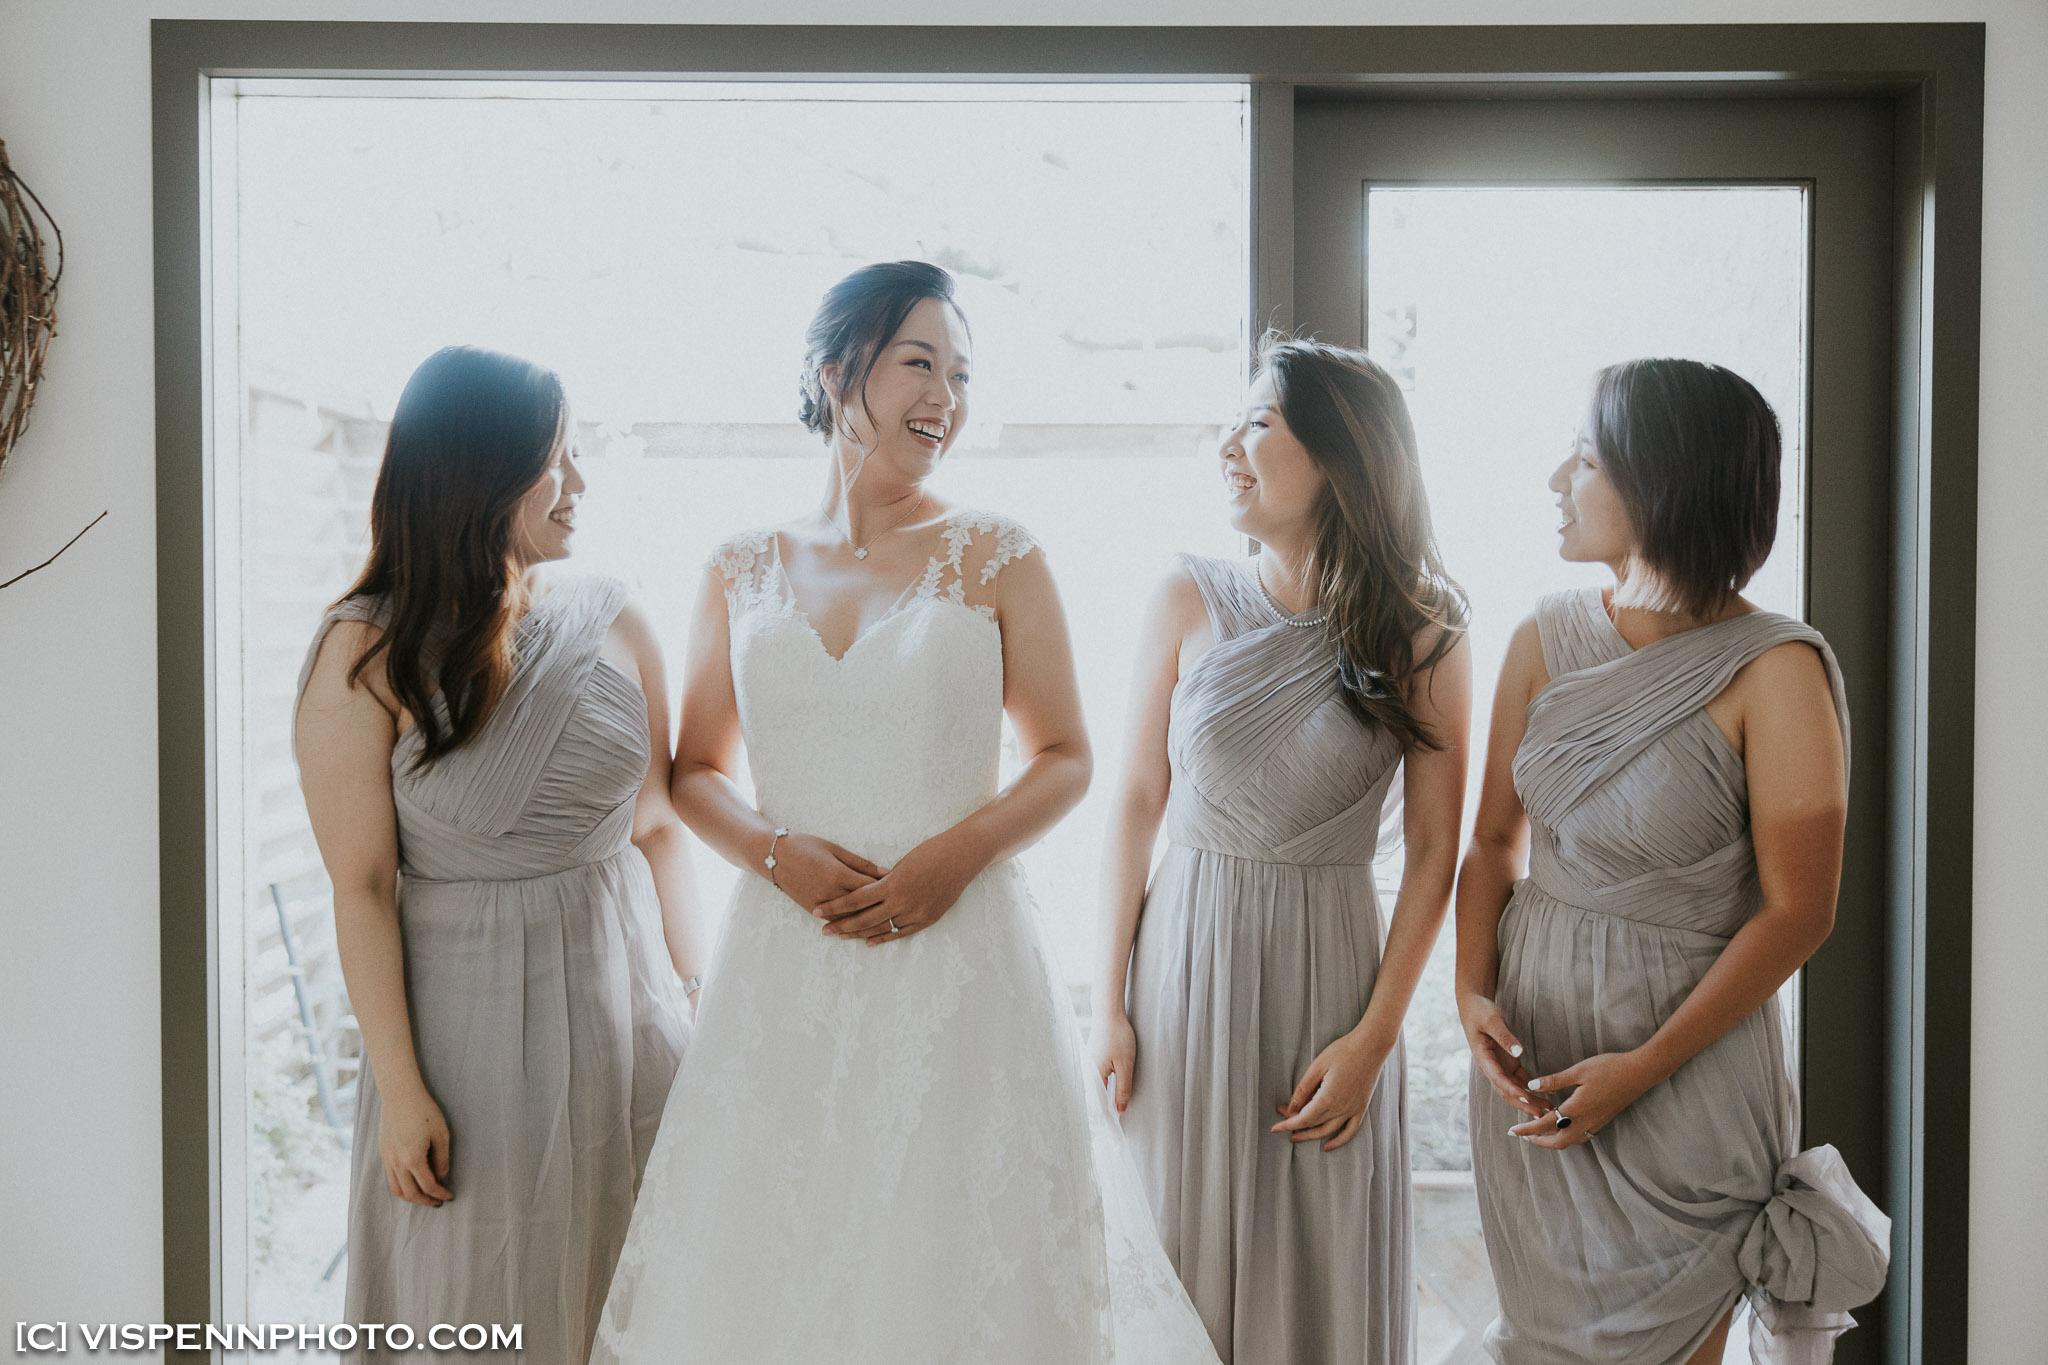 WEDDING DAY Photography Melbourne LeanneWesley 02375 1P EOSR ZHPENN